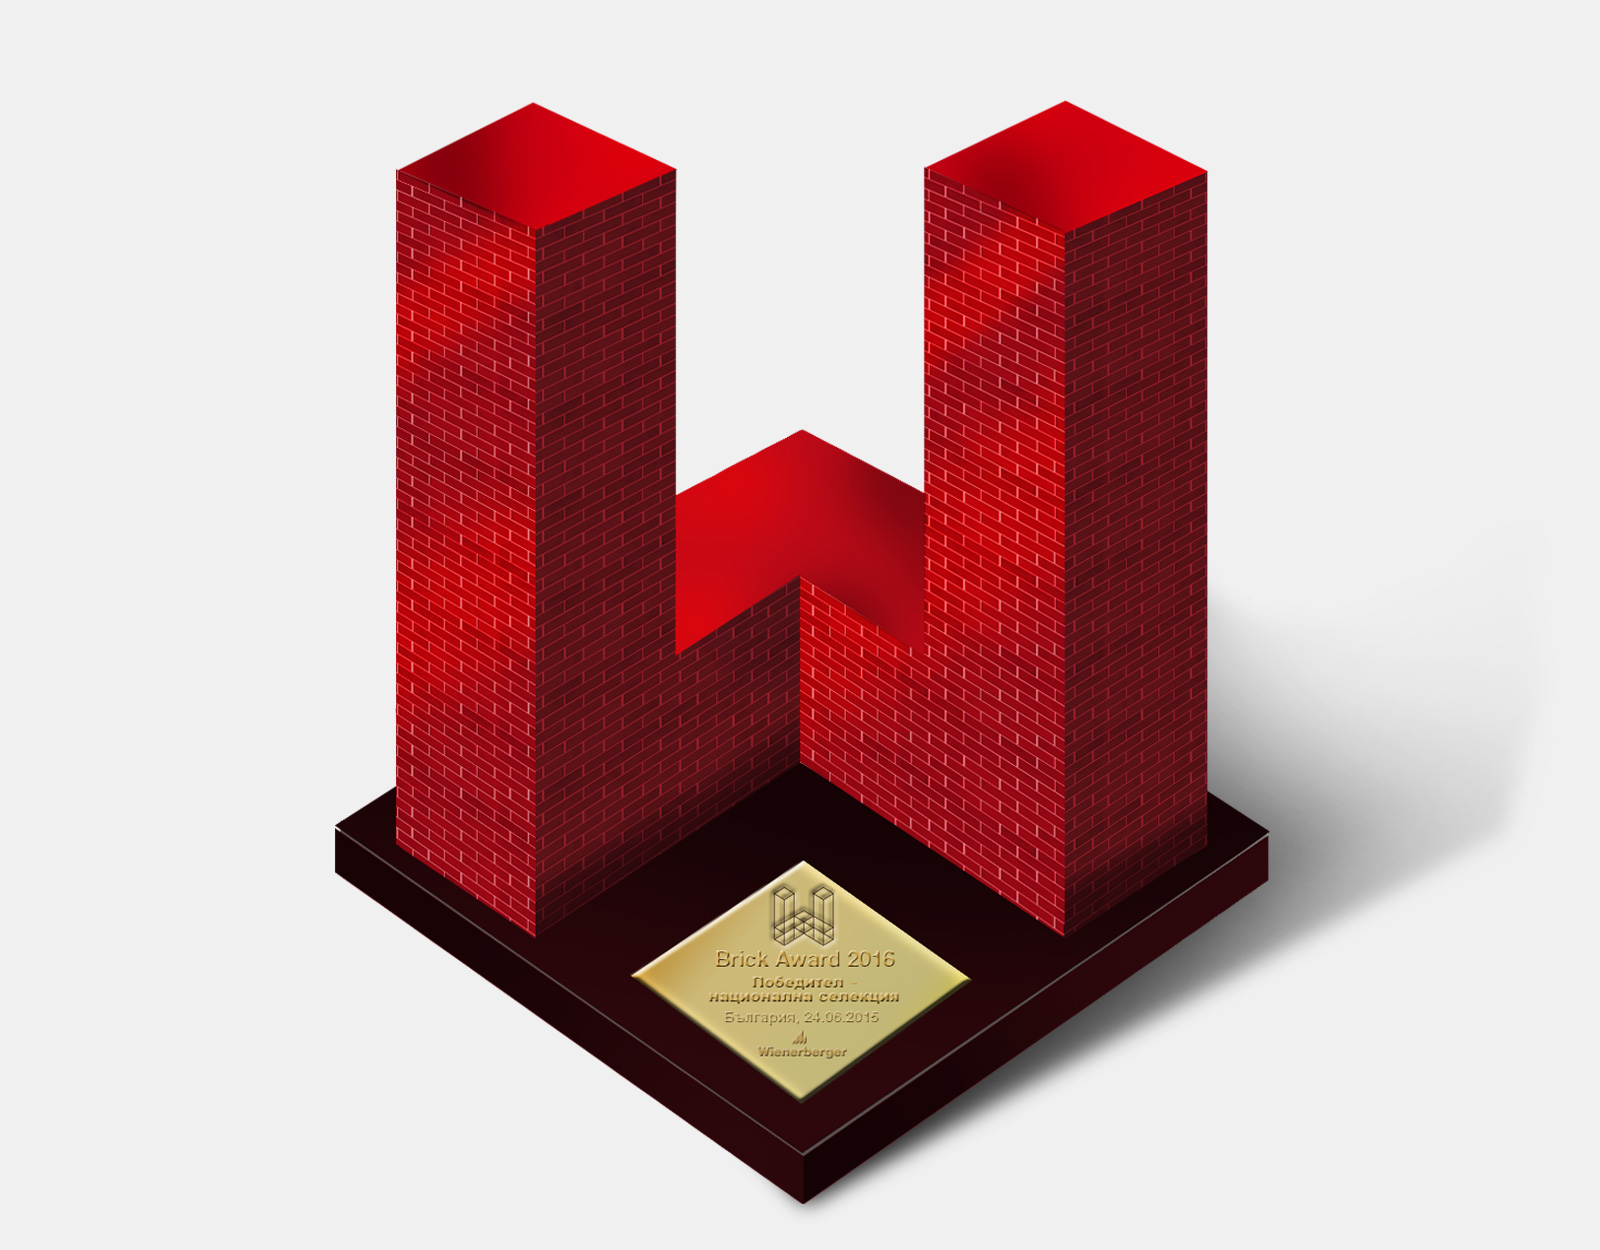 Brick Award 2016 награда/ Wienerberger